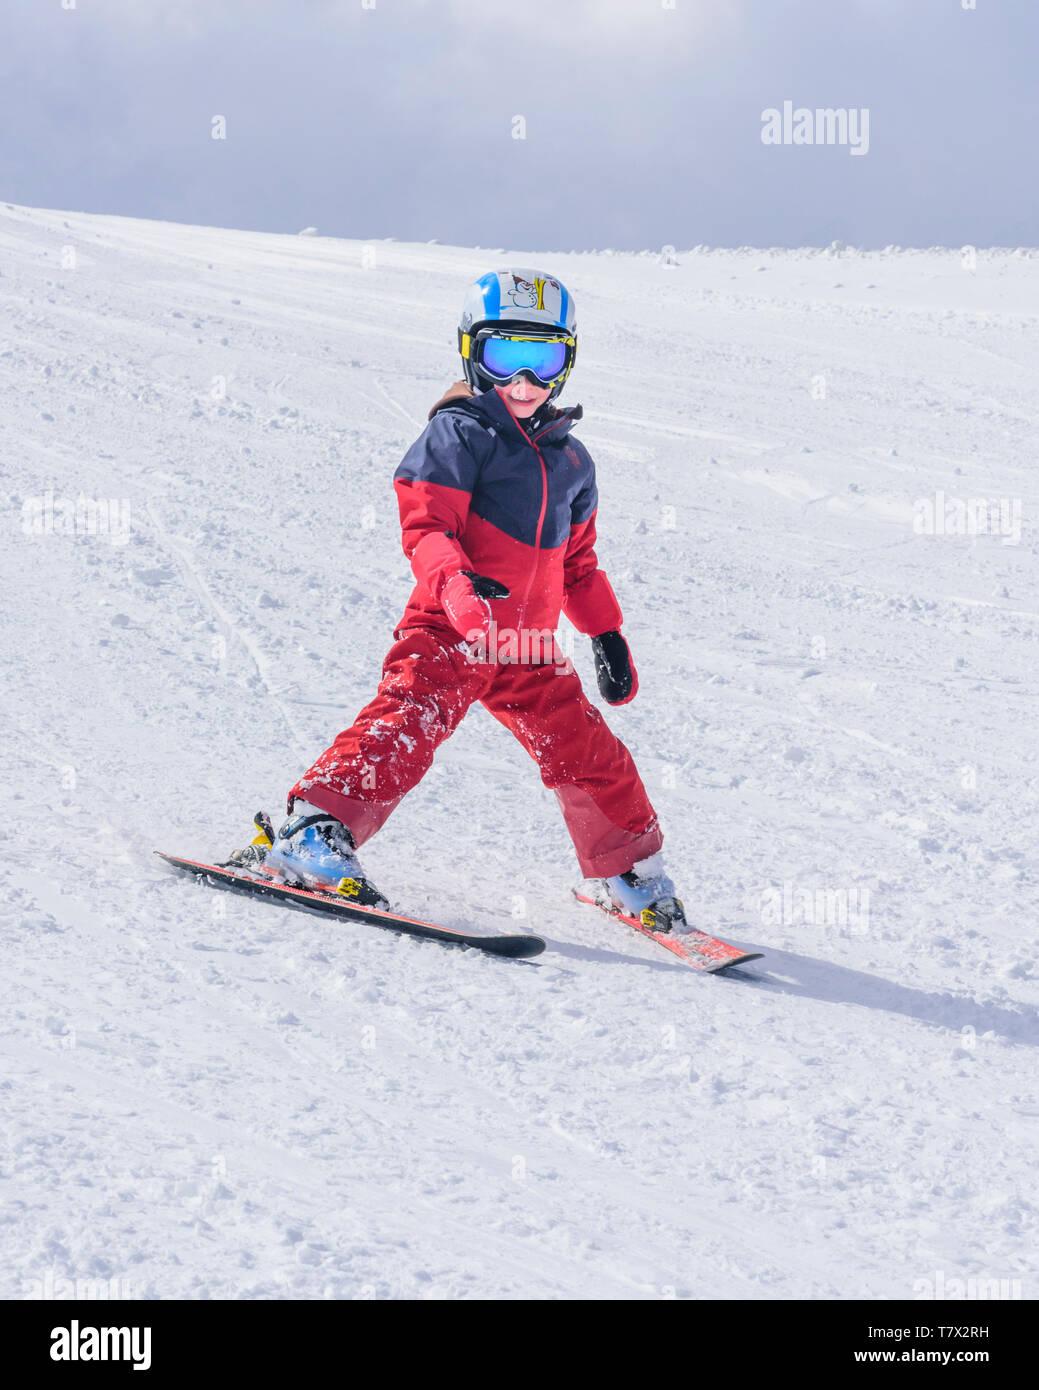 Cute little boy skiing on slope Stock Photo